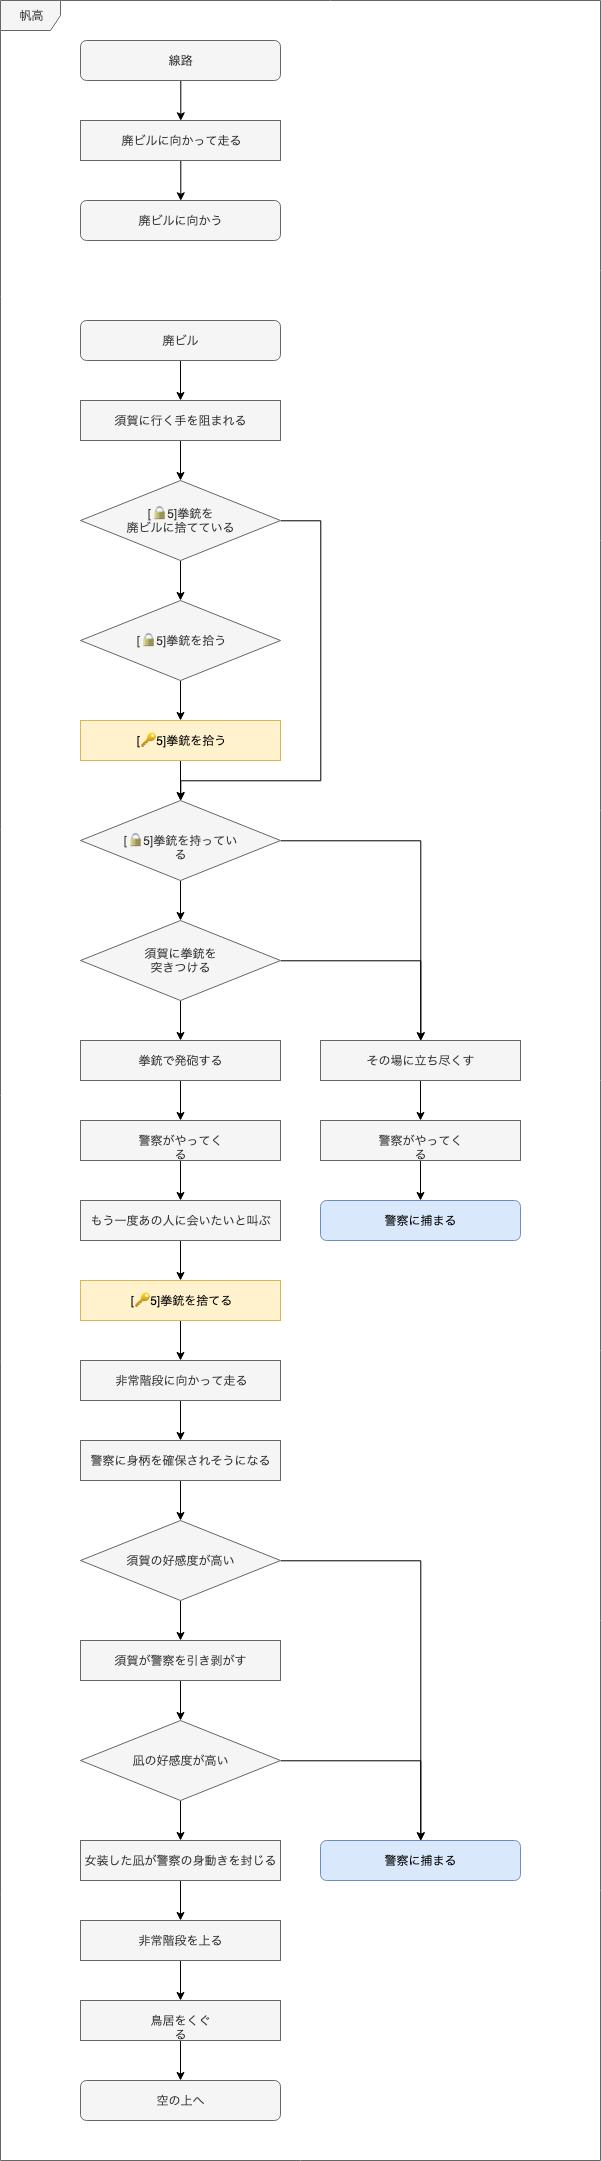 https://cdn-ak.f.st-hatena.com/images/fotolife/m/munieru_jp/20190913/20190913181011_original.png